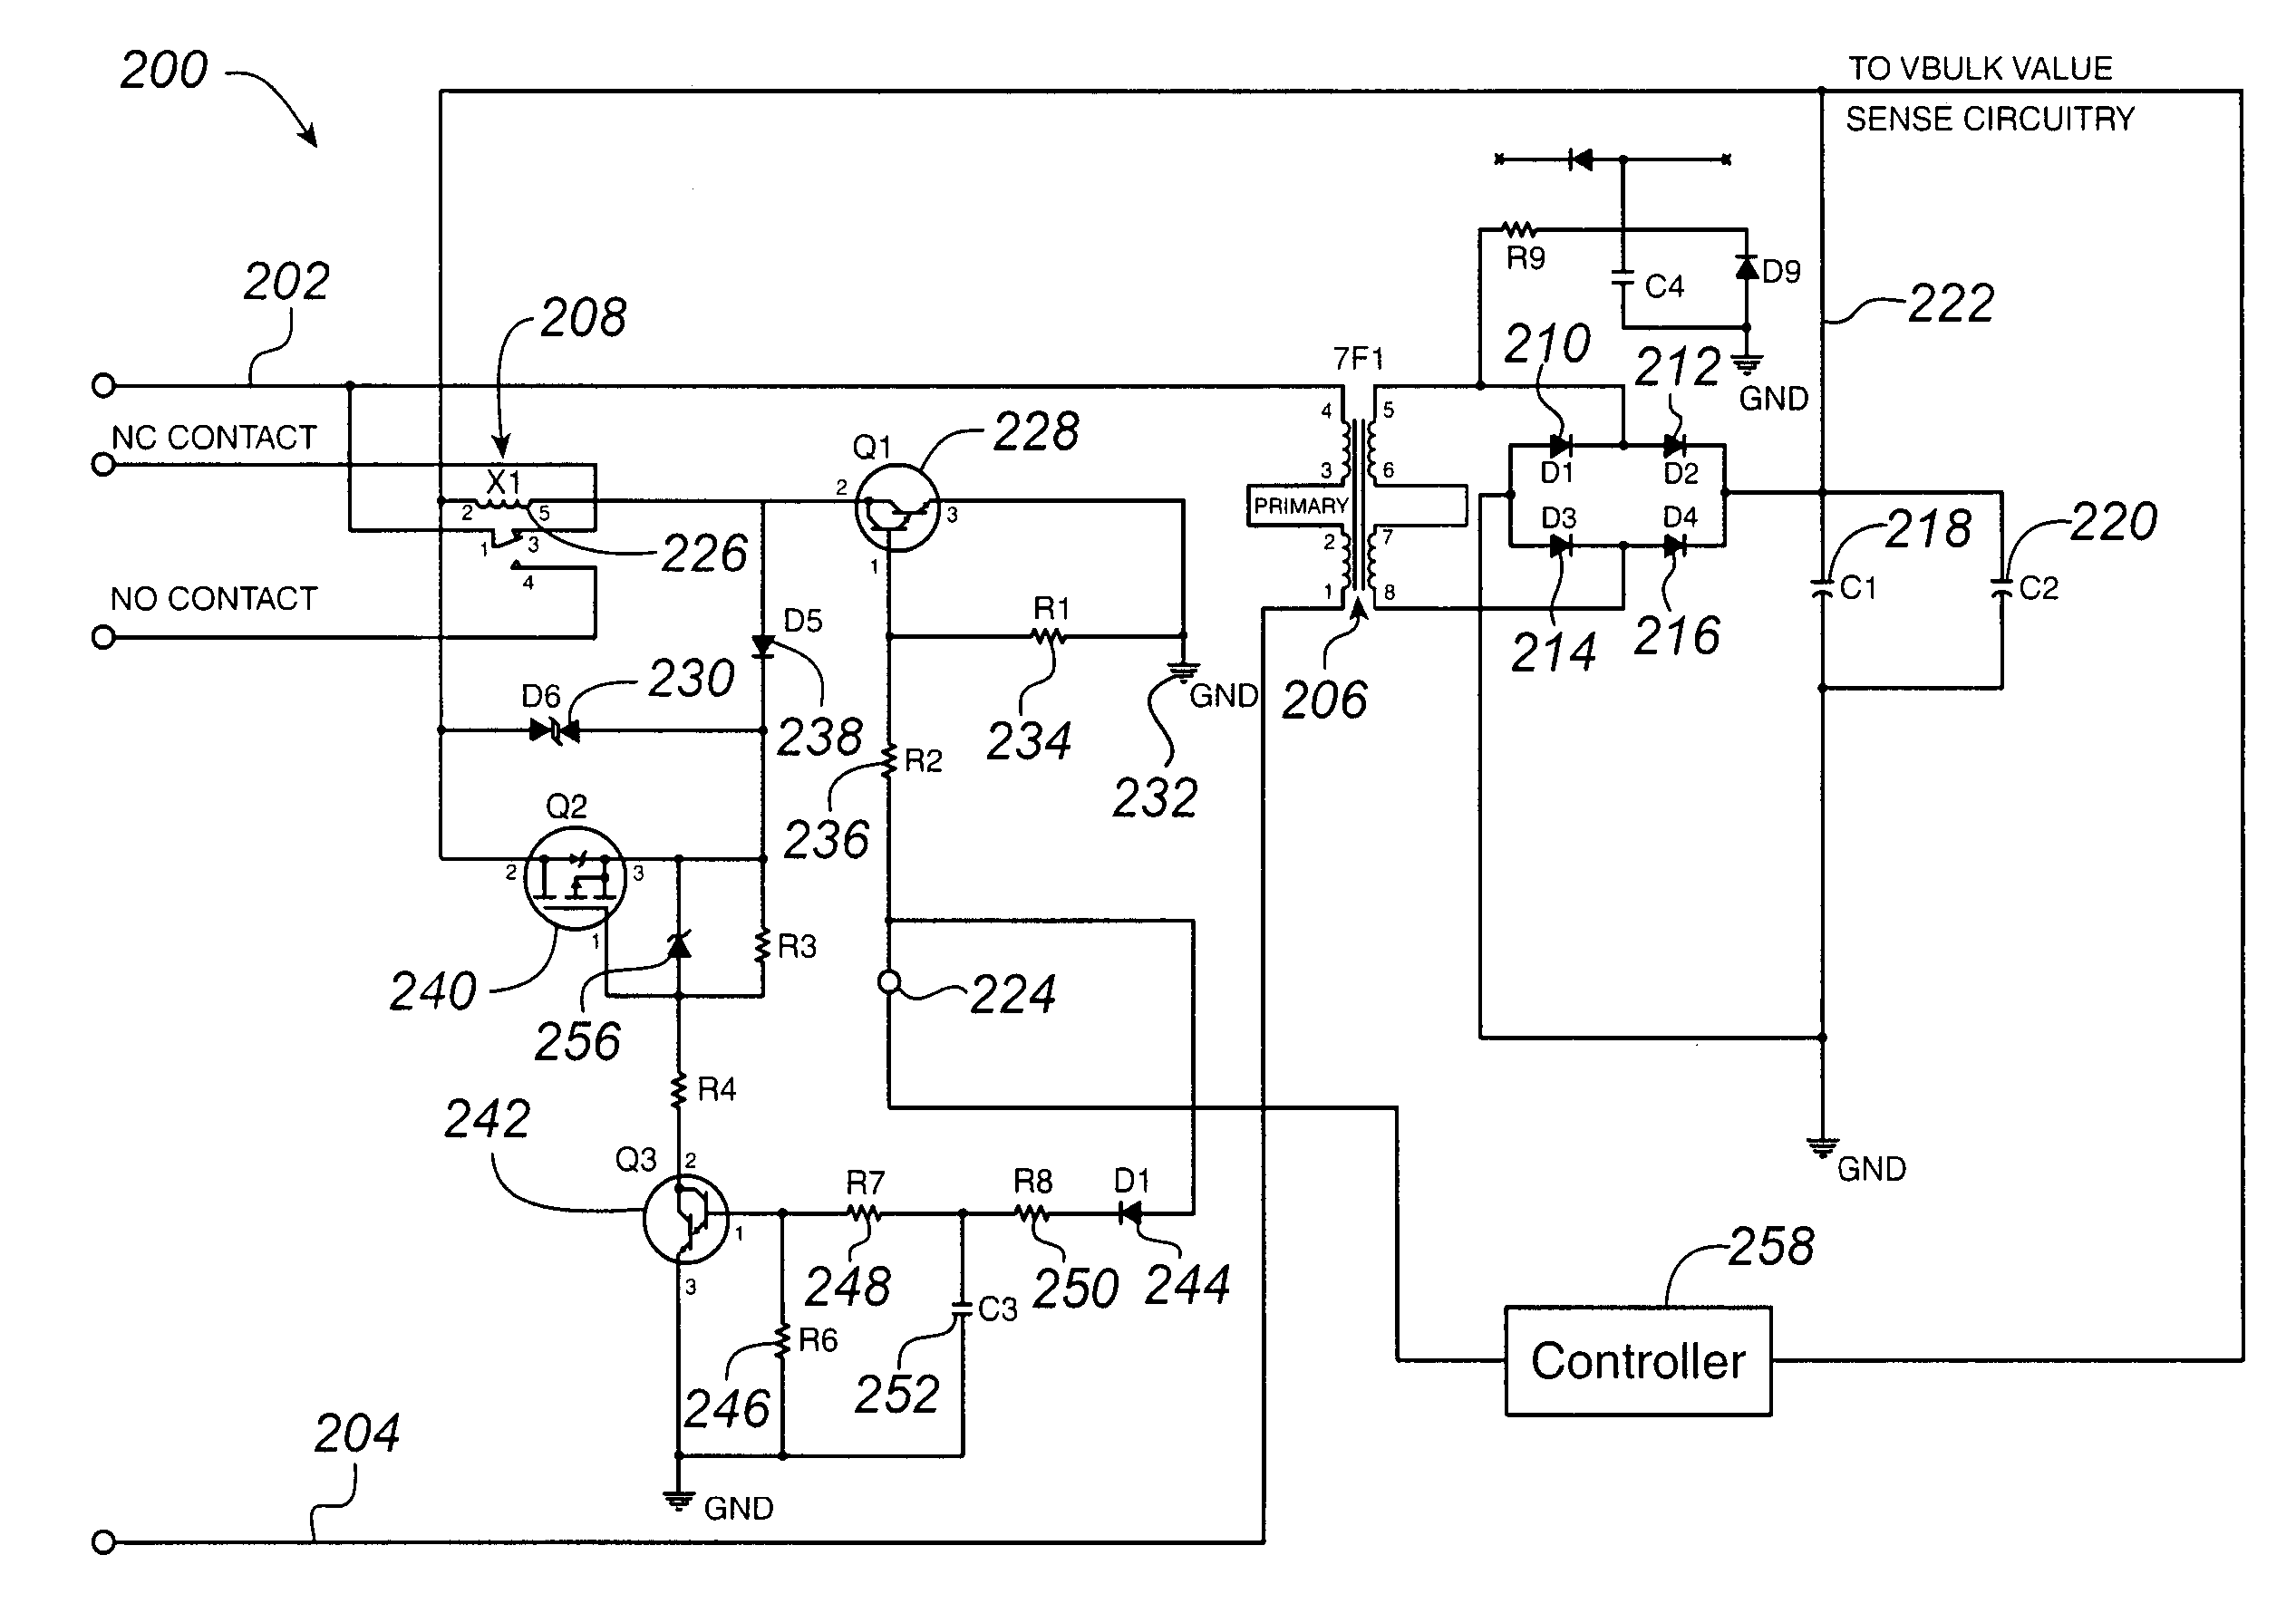 freezer defrost wiring diagrams hvac wiring schematic defrost timer schematic commercial freezer defrost timer wiring #3